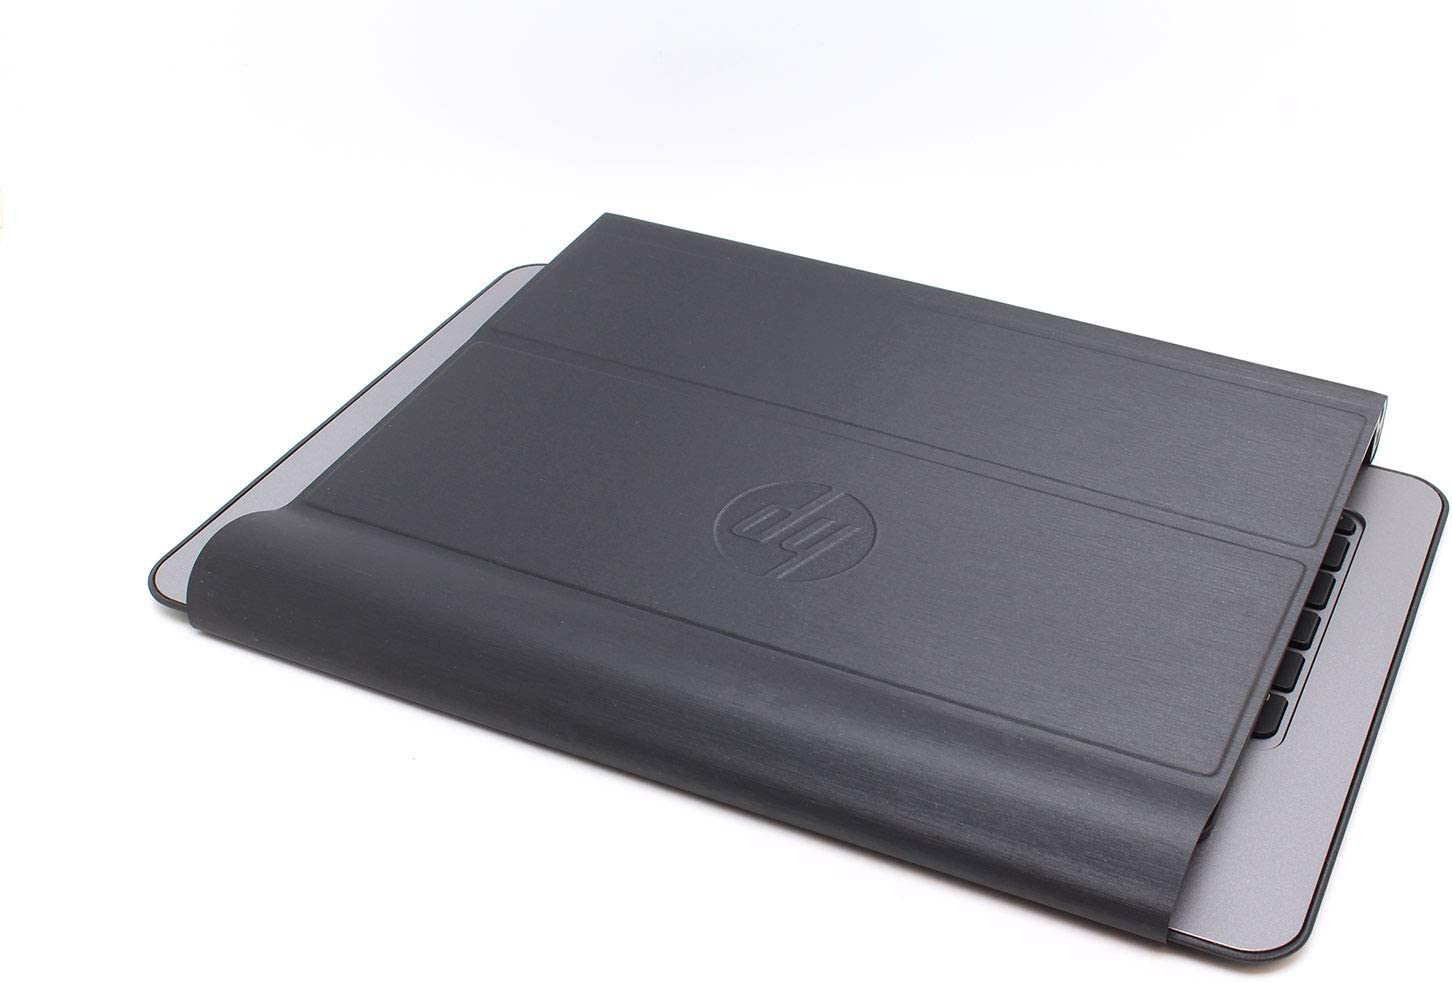 Renewed HP Pro x2 612 Travel Keyboard